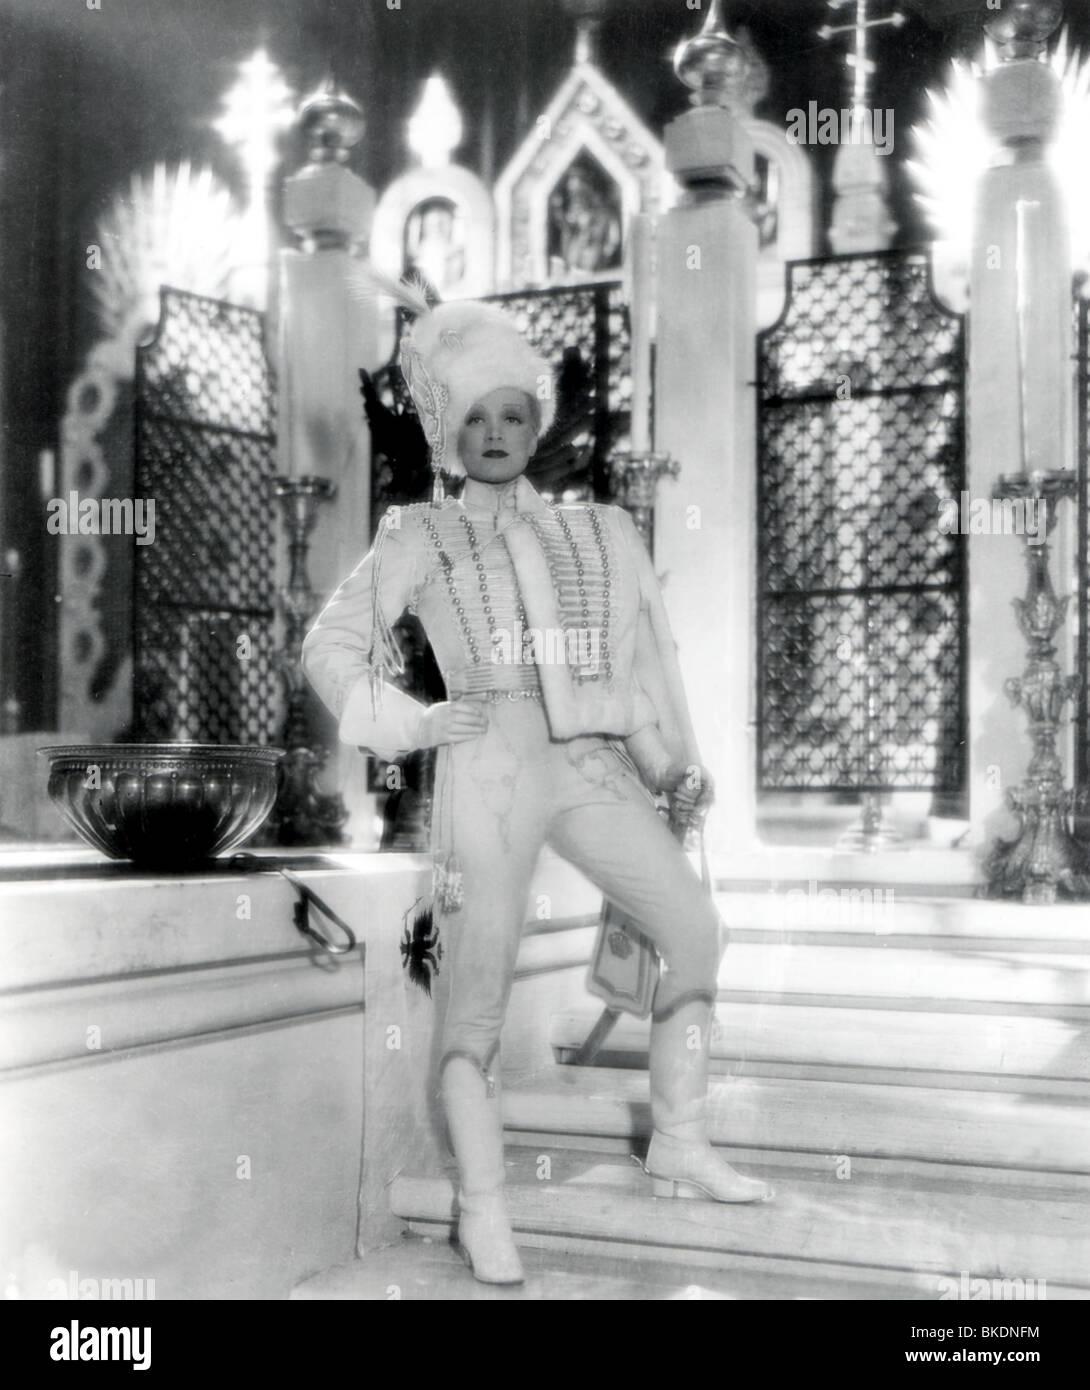 THE SCARLET EMPRESS (1934) MARLENE DIETRICH SCEP 003P - Stock Image